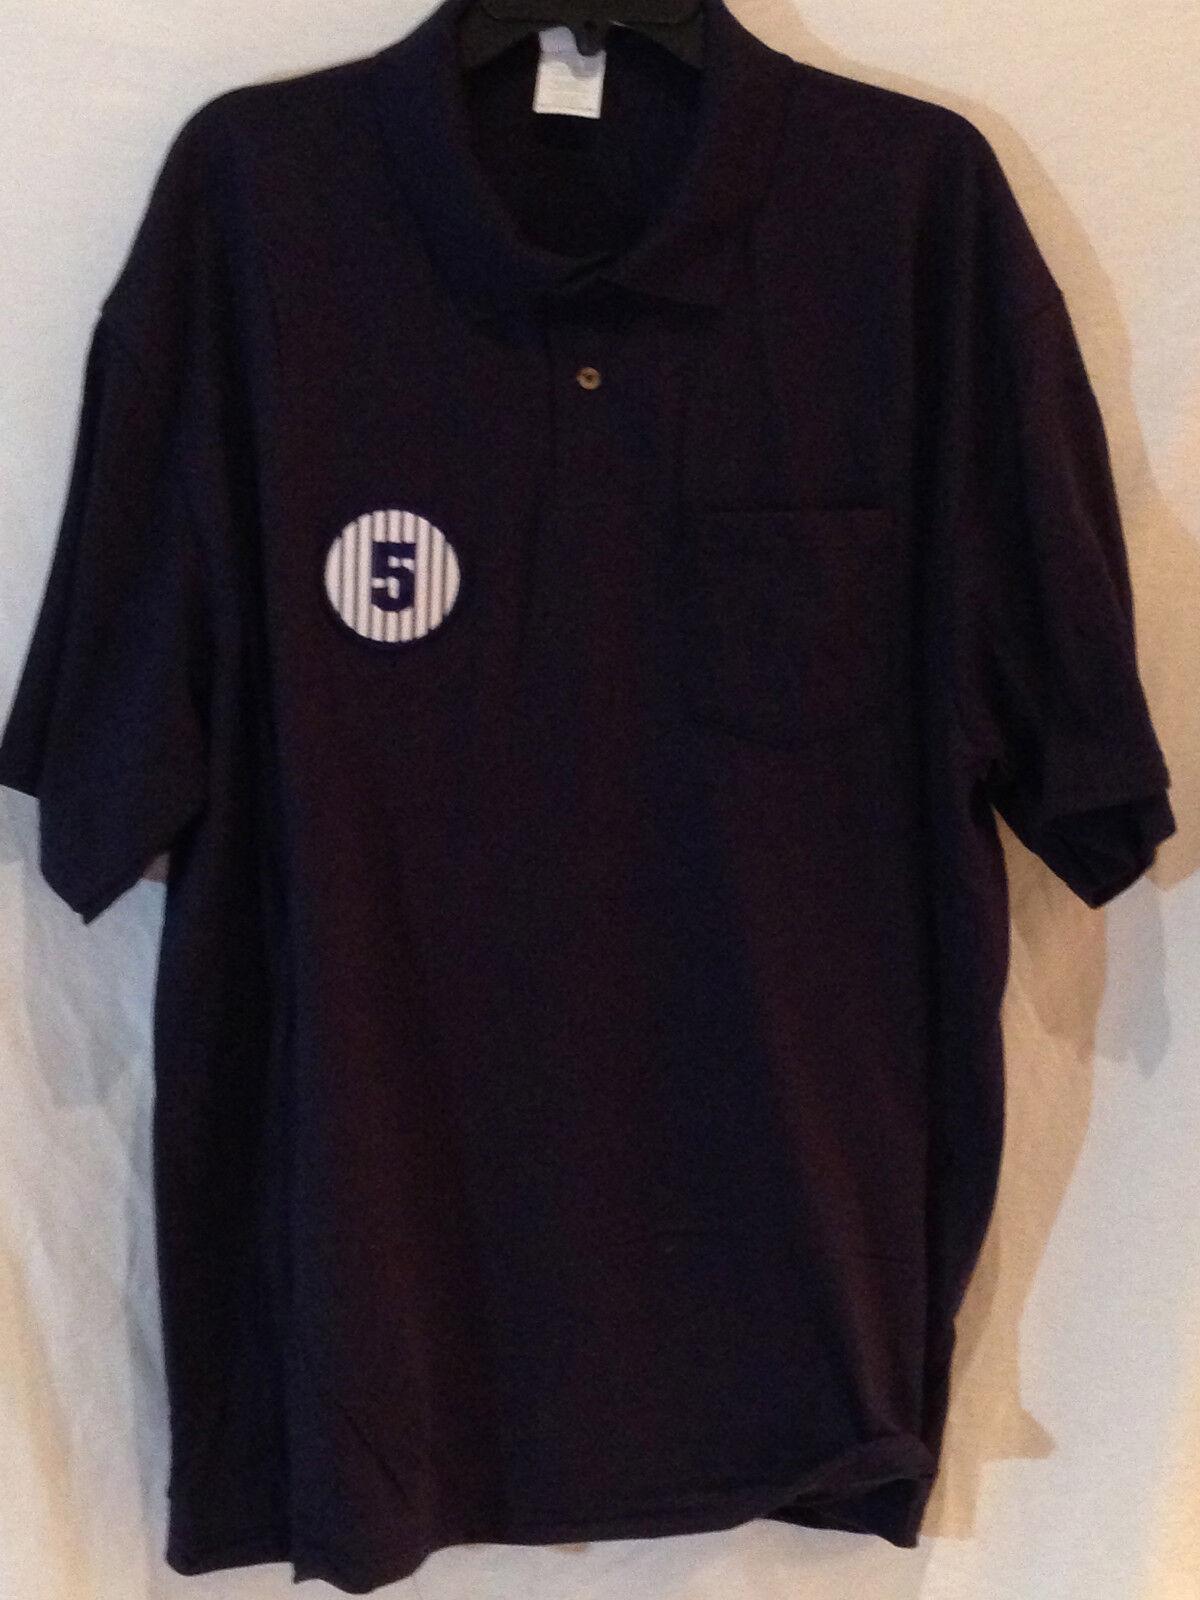 New York Yankees Joe Dimaggio Poloshirt Shirt-Mlb Cool Team GEAR-2XL-JOLTIN GEAR-2XL-JOLTIN GEAR-2XL-JOLTIN Joe a8d0e1